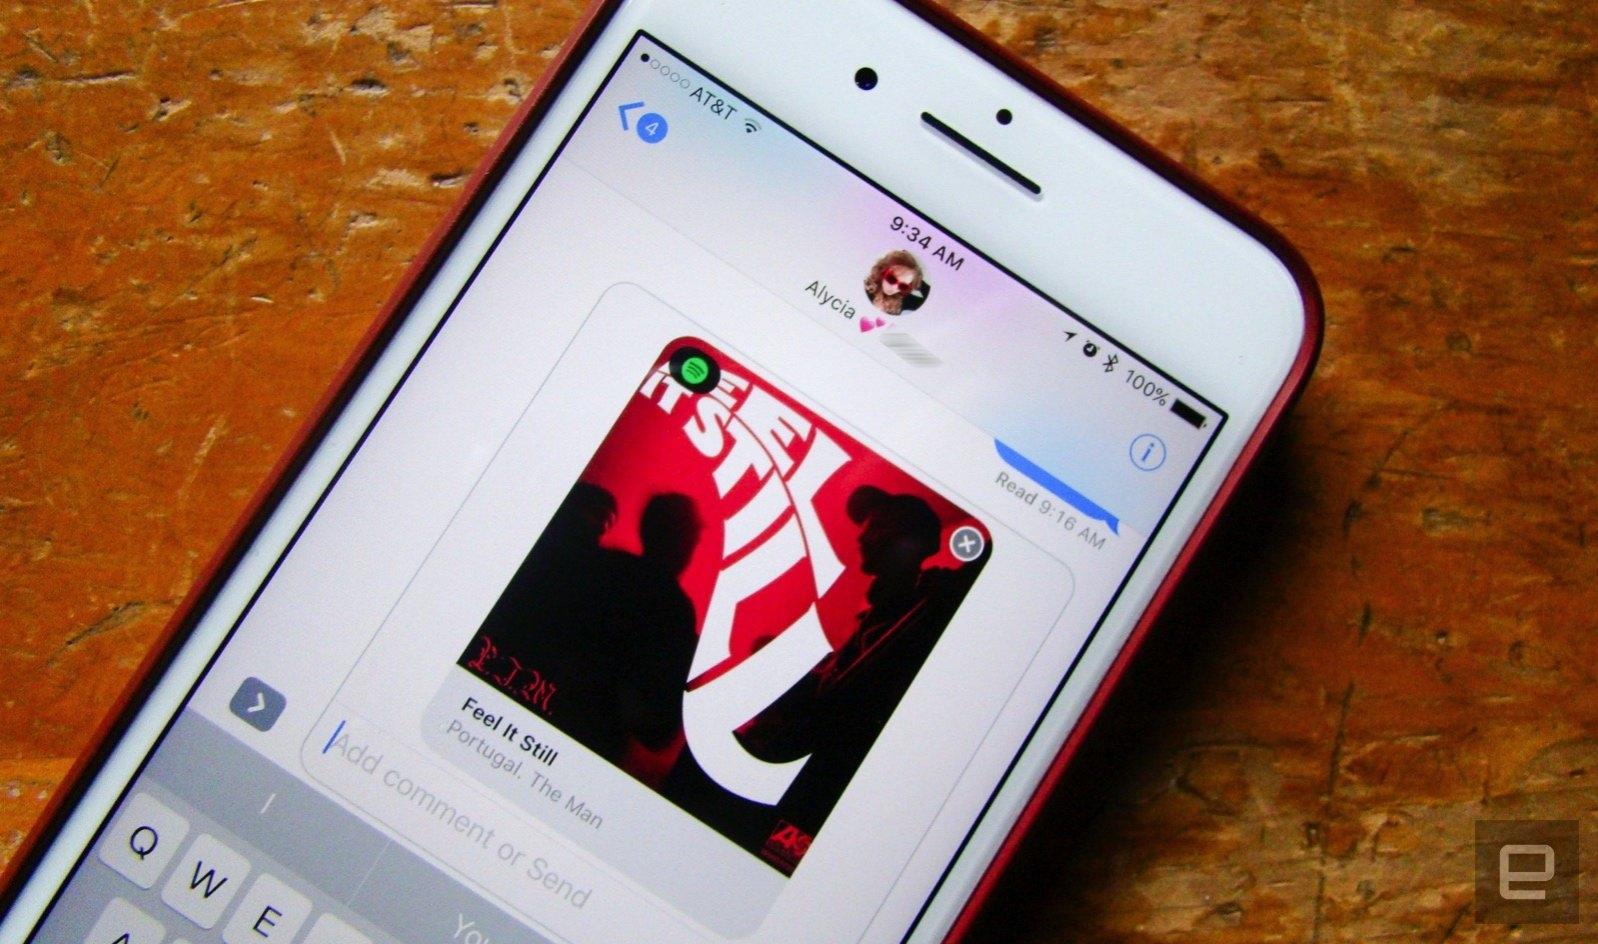 Apple 預計下週修正文字訊息漏洞「ChaiOS」